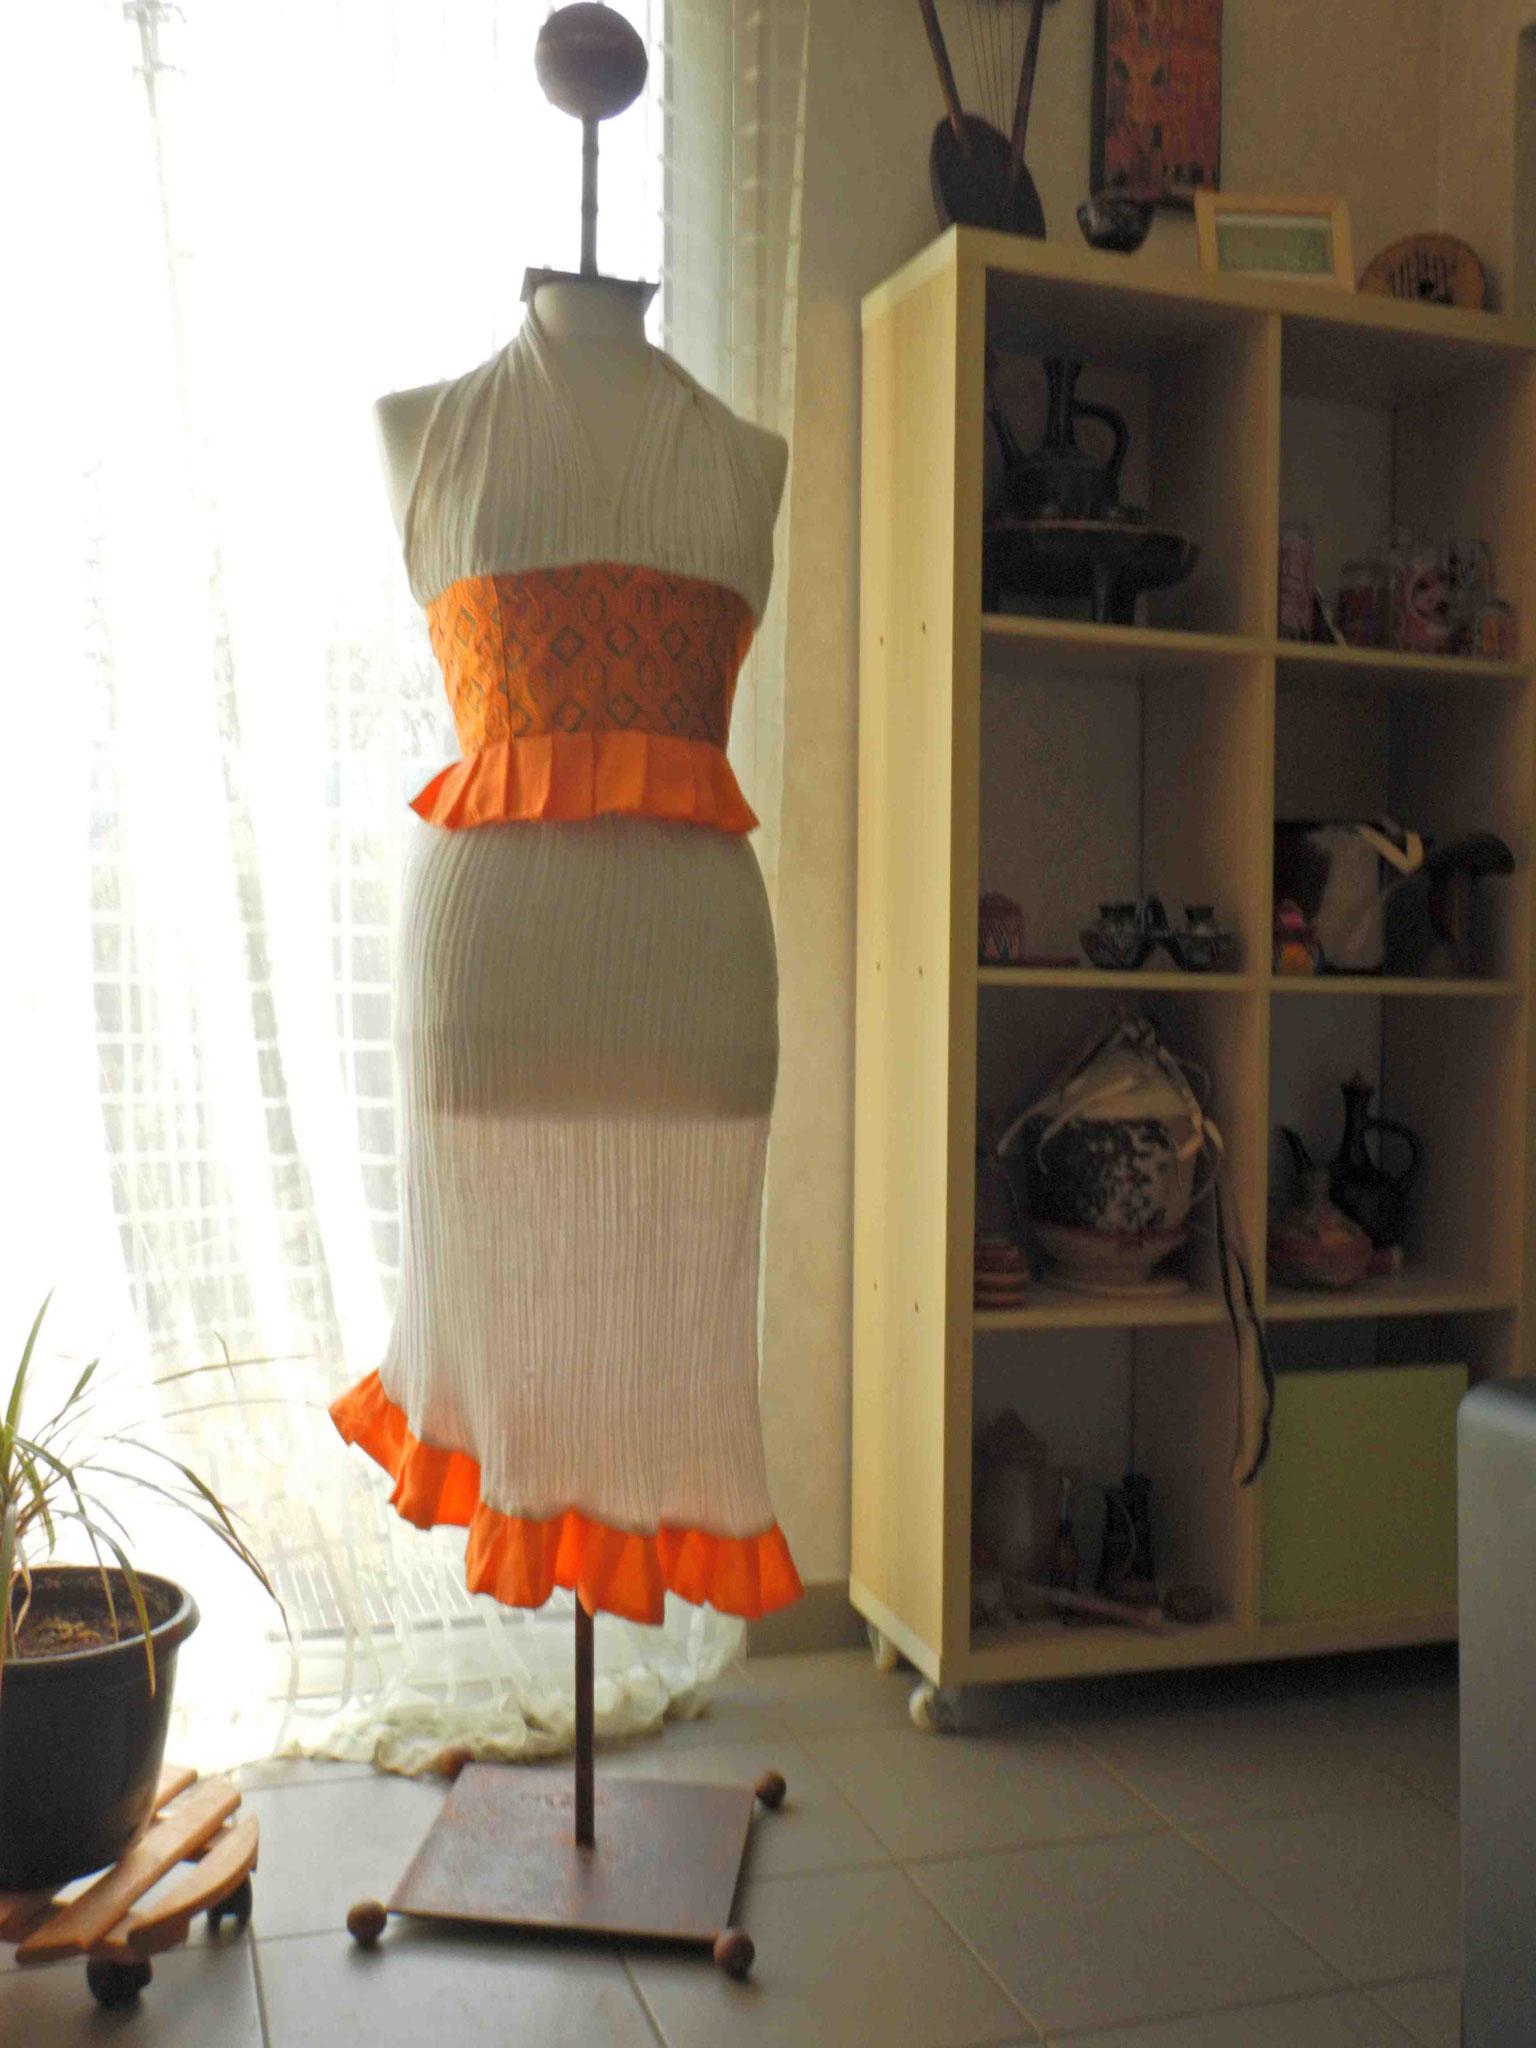 Robe Habesha éthiopienne Coton Ethiopie Artisanat ethiopien Epices made by locals Café Ethiopie solidaire équitable textils voyage Ethiopie